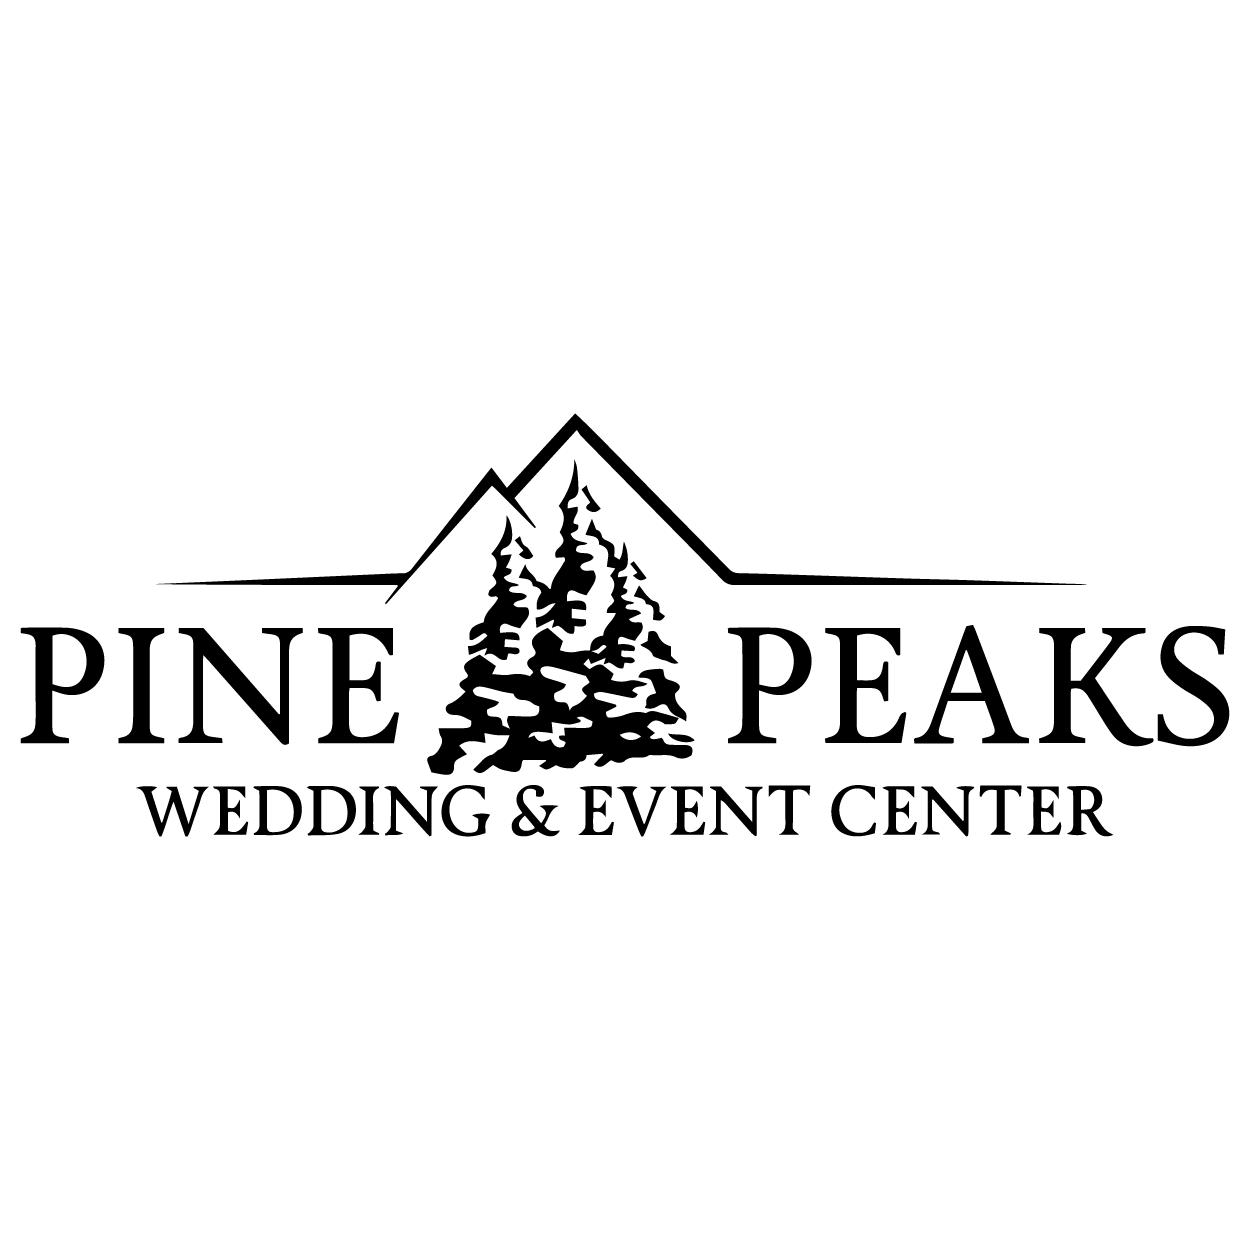 Pine Peaks Wedding & Event Center Logo - Pioneer Promo Client